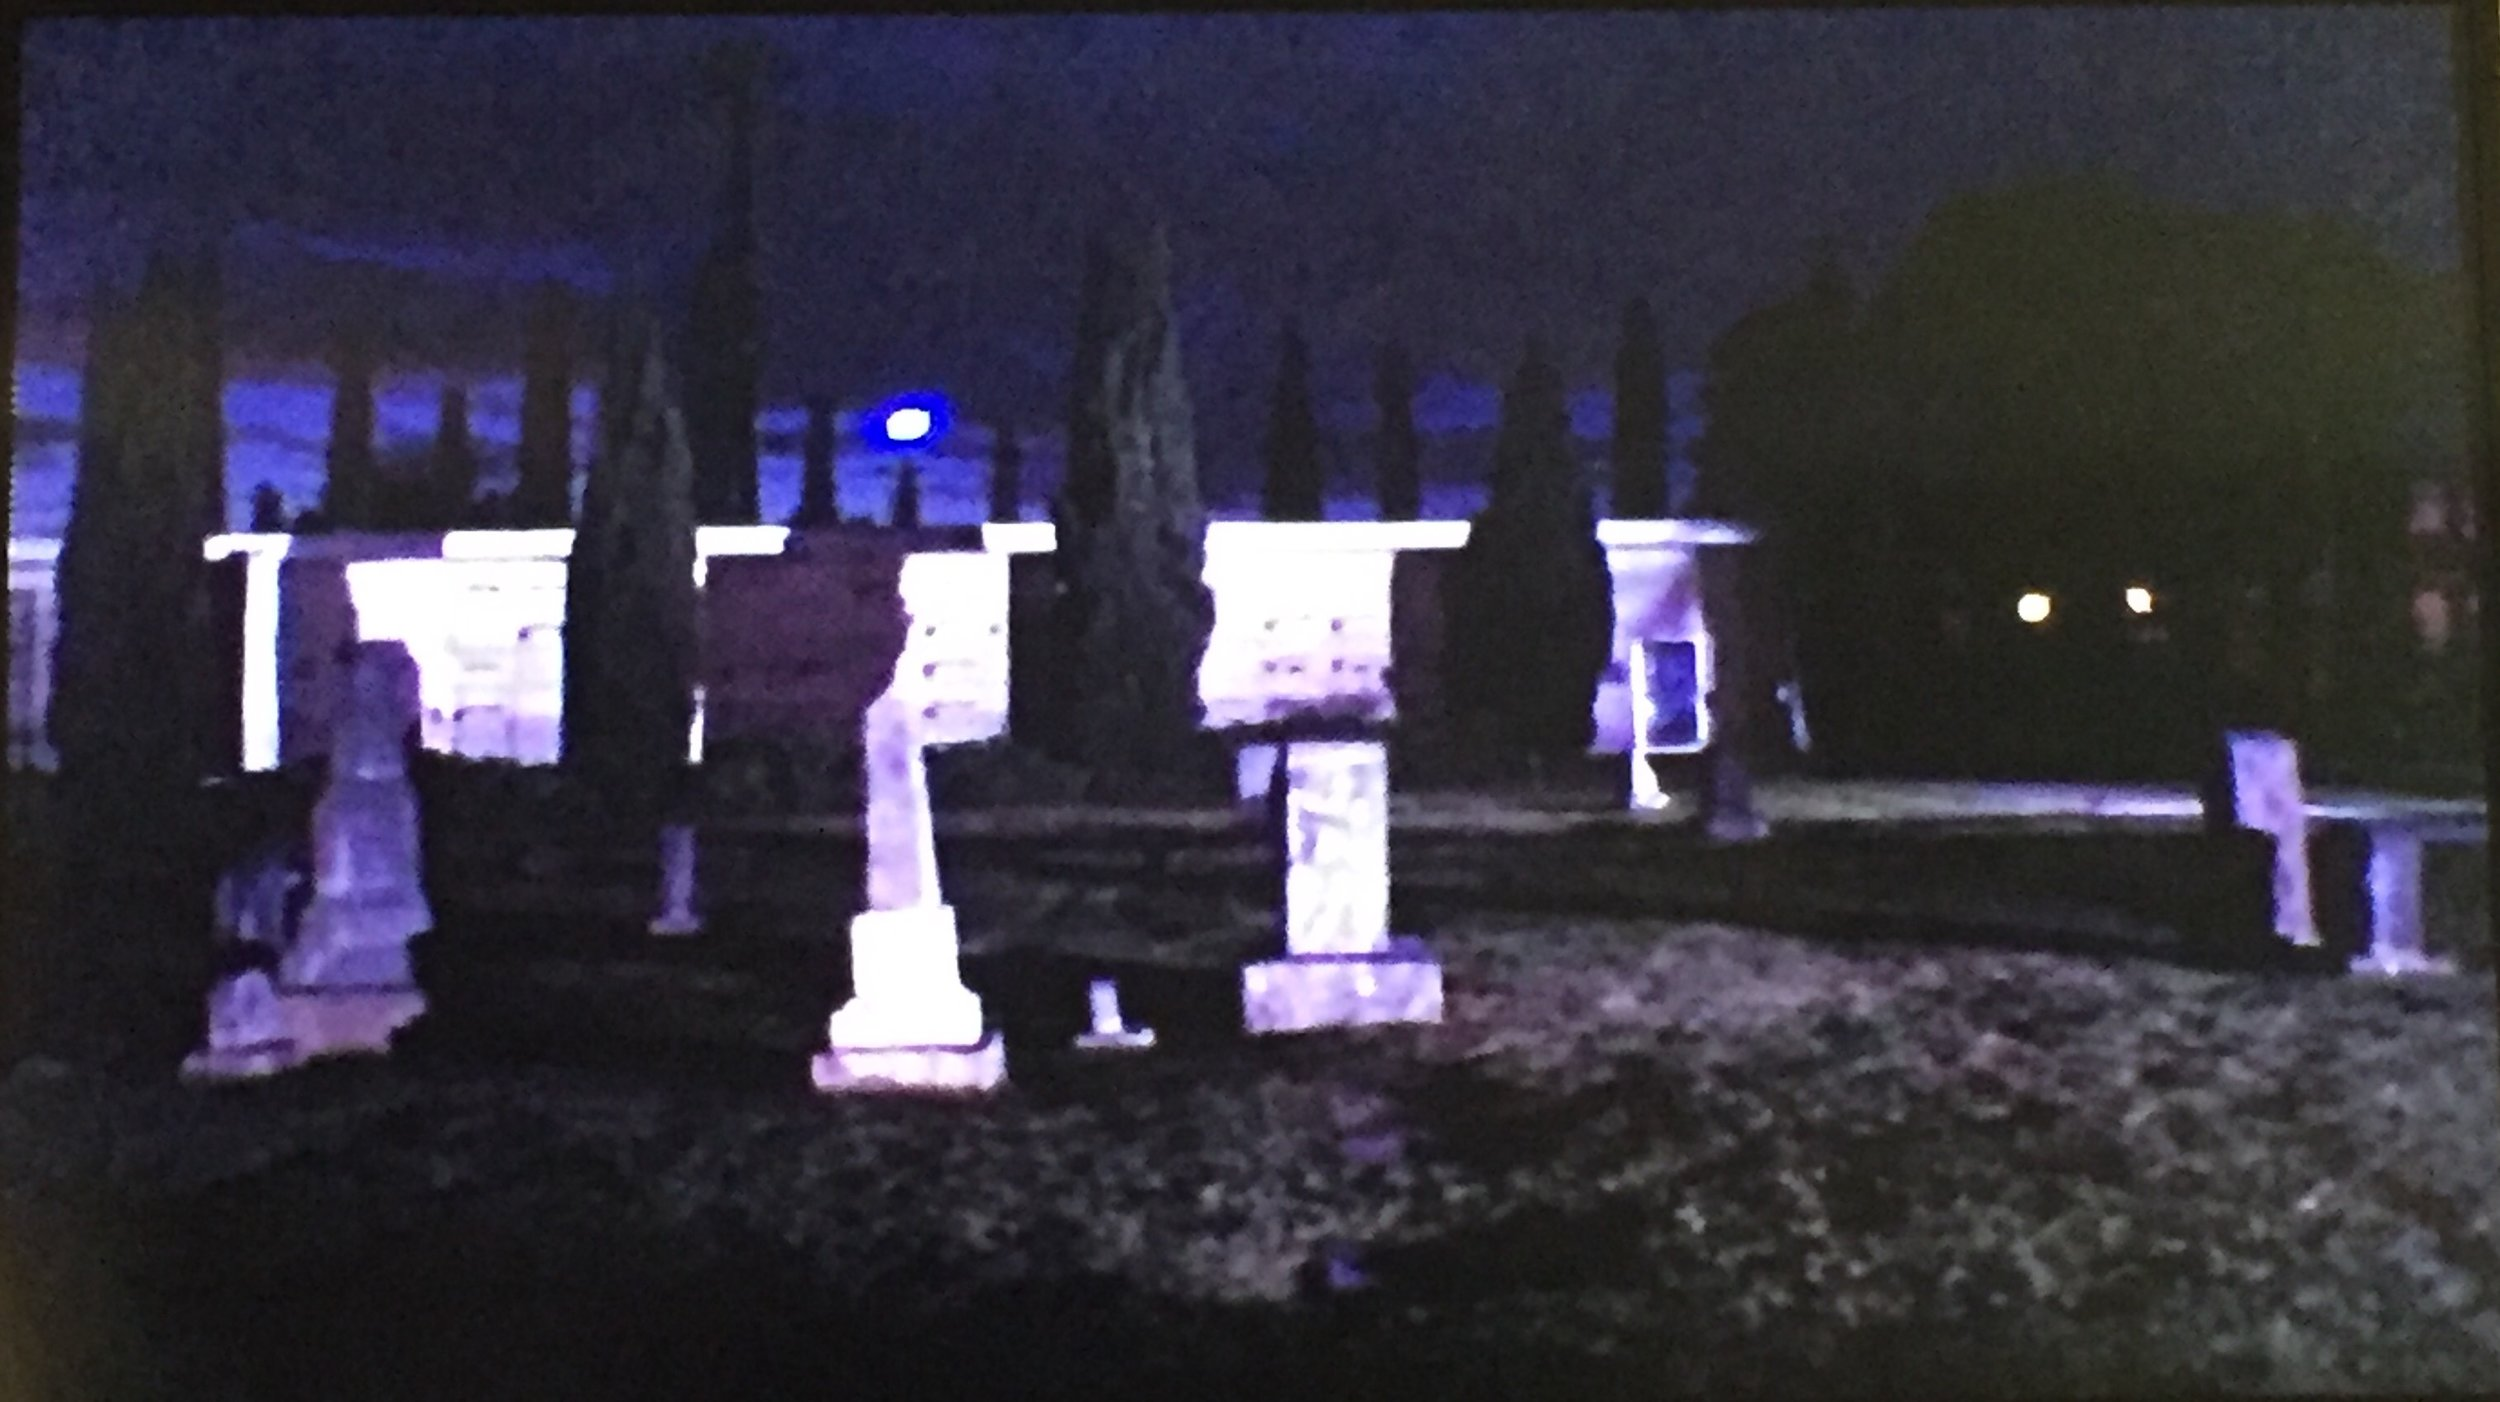 Jankiest cemetery.